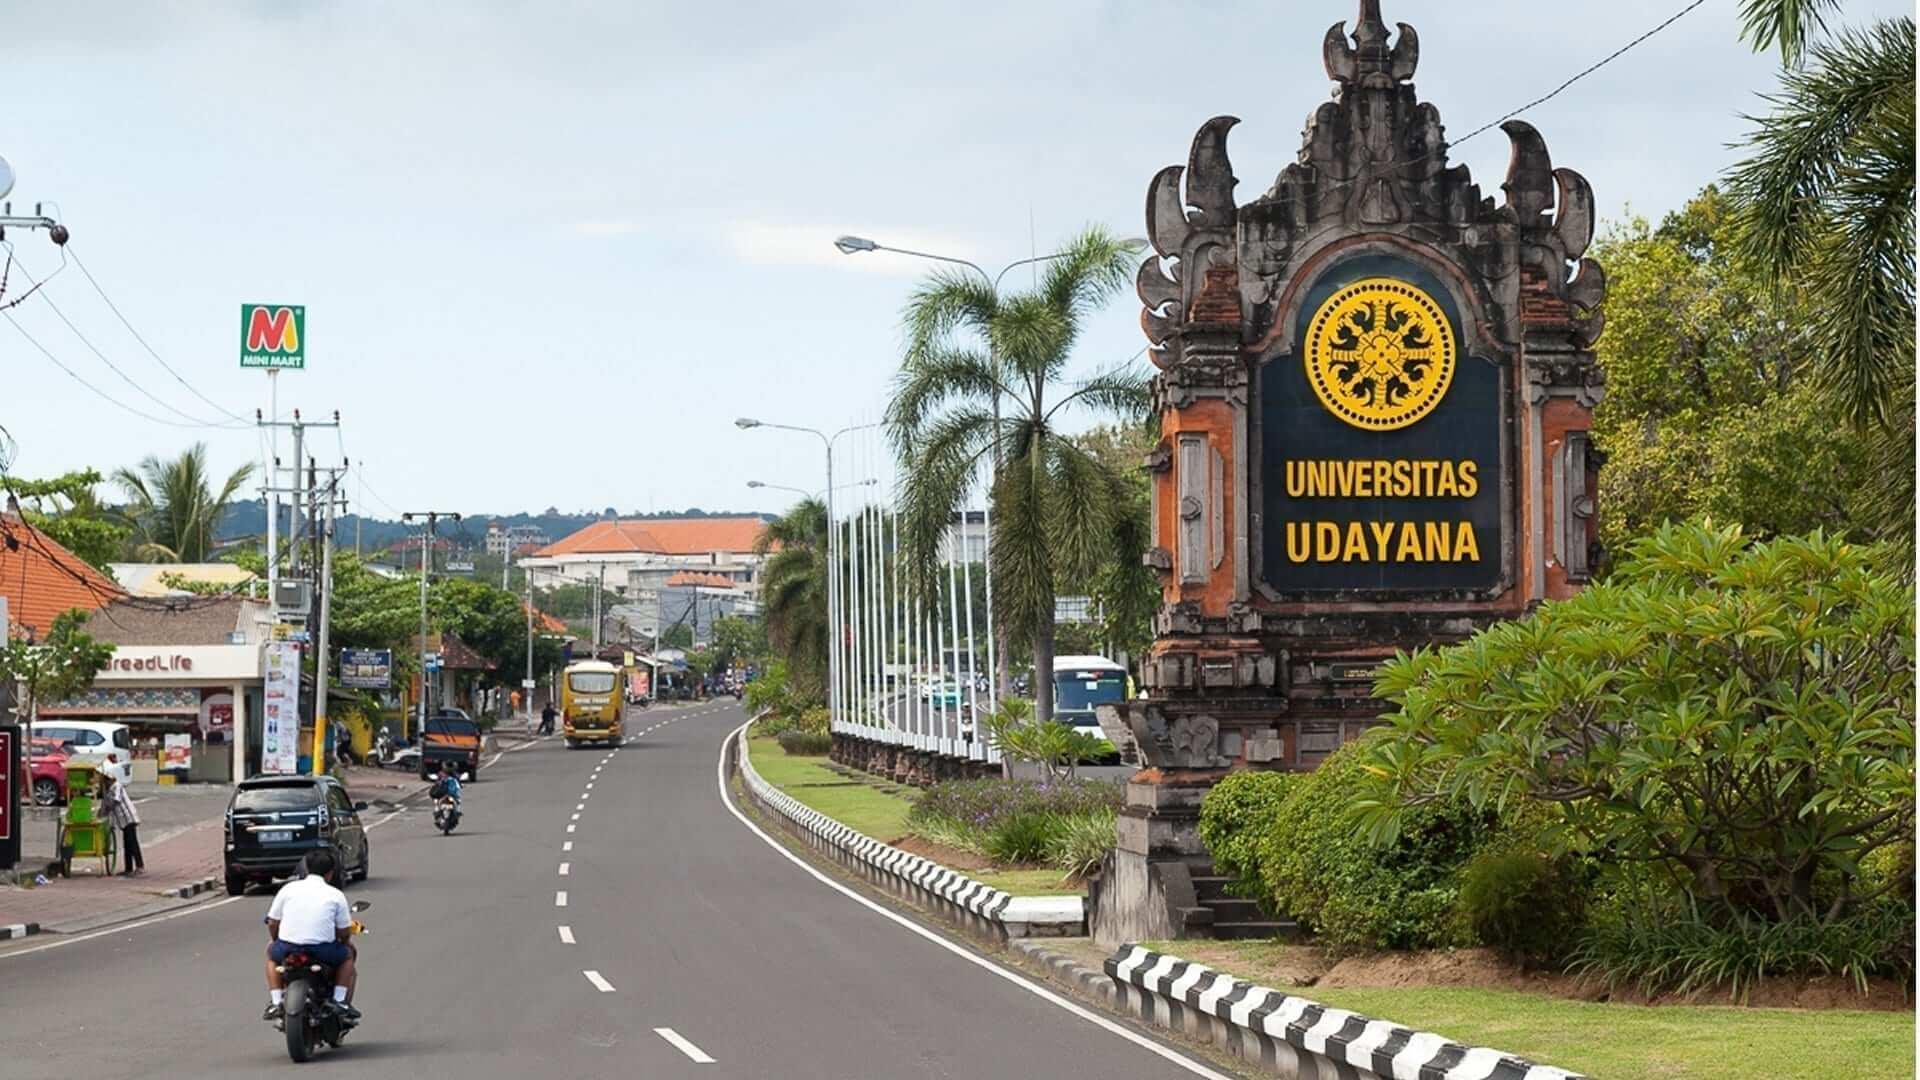 udayana university road sign